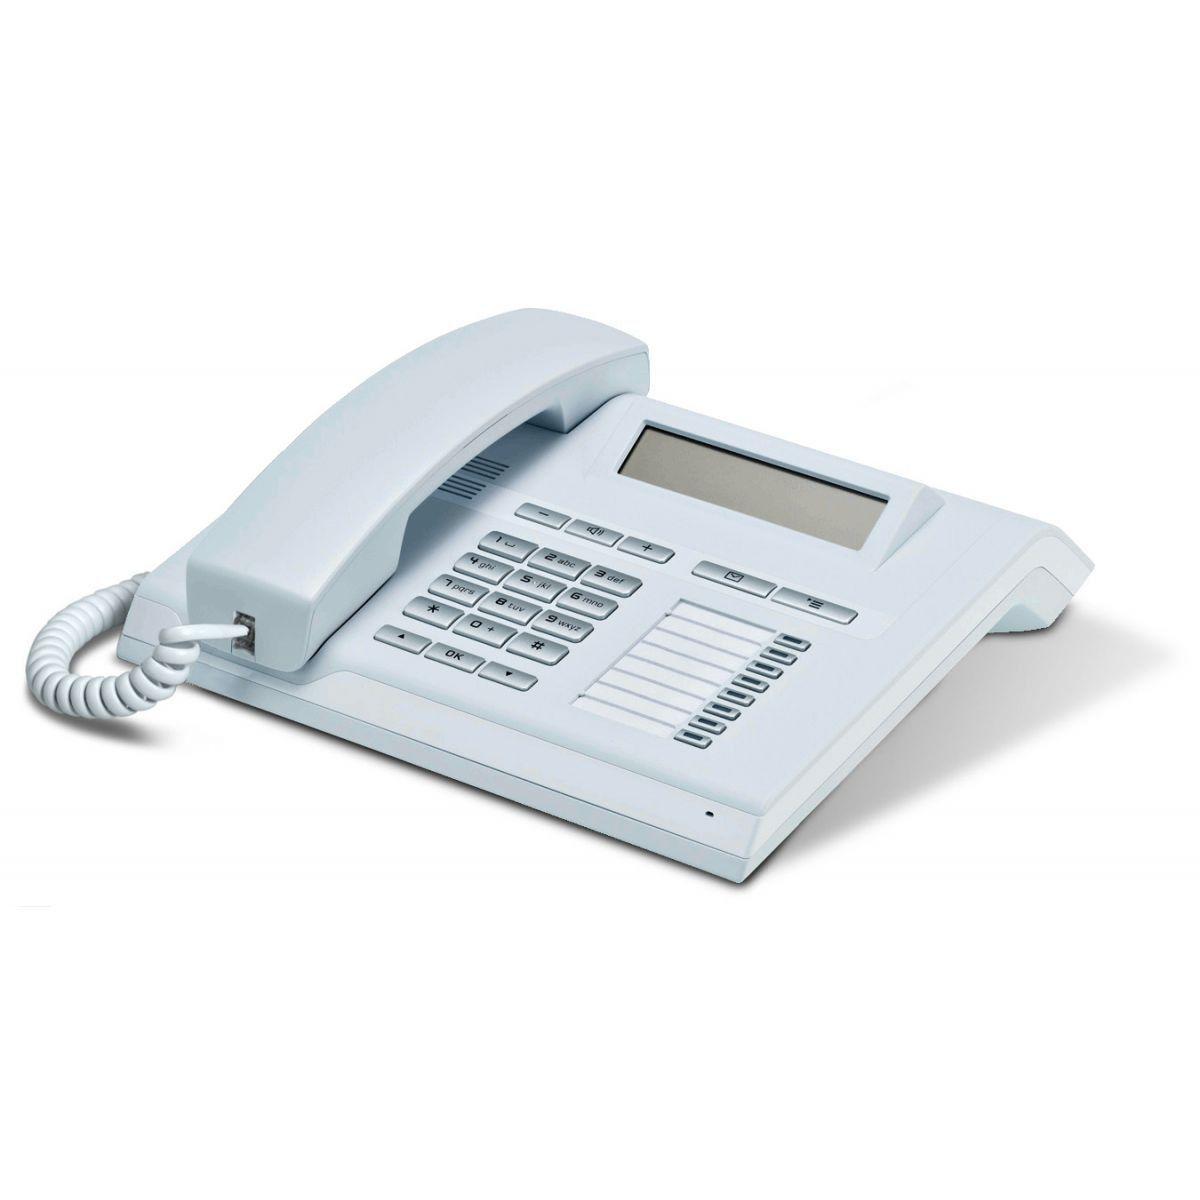 Telefone Digital OpenStage 15 HFA - Unify/Siemens